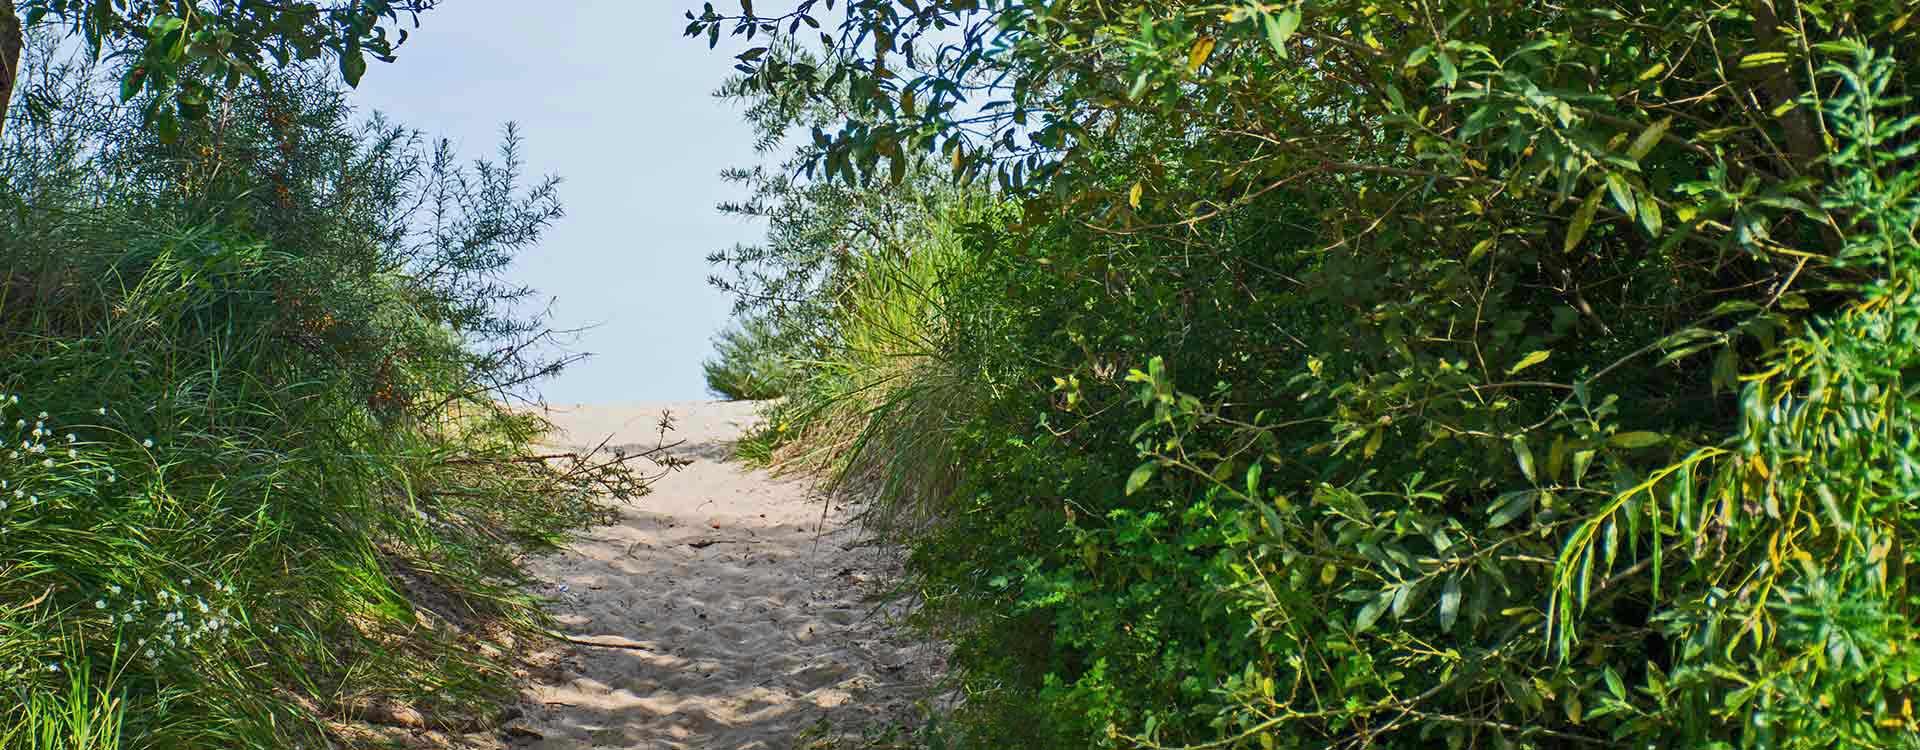 Strandaufgang Dünen Hinter der Düne Ückeritz Usedom Ostsee